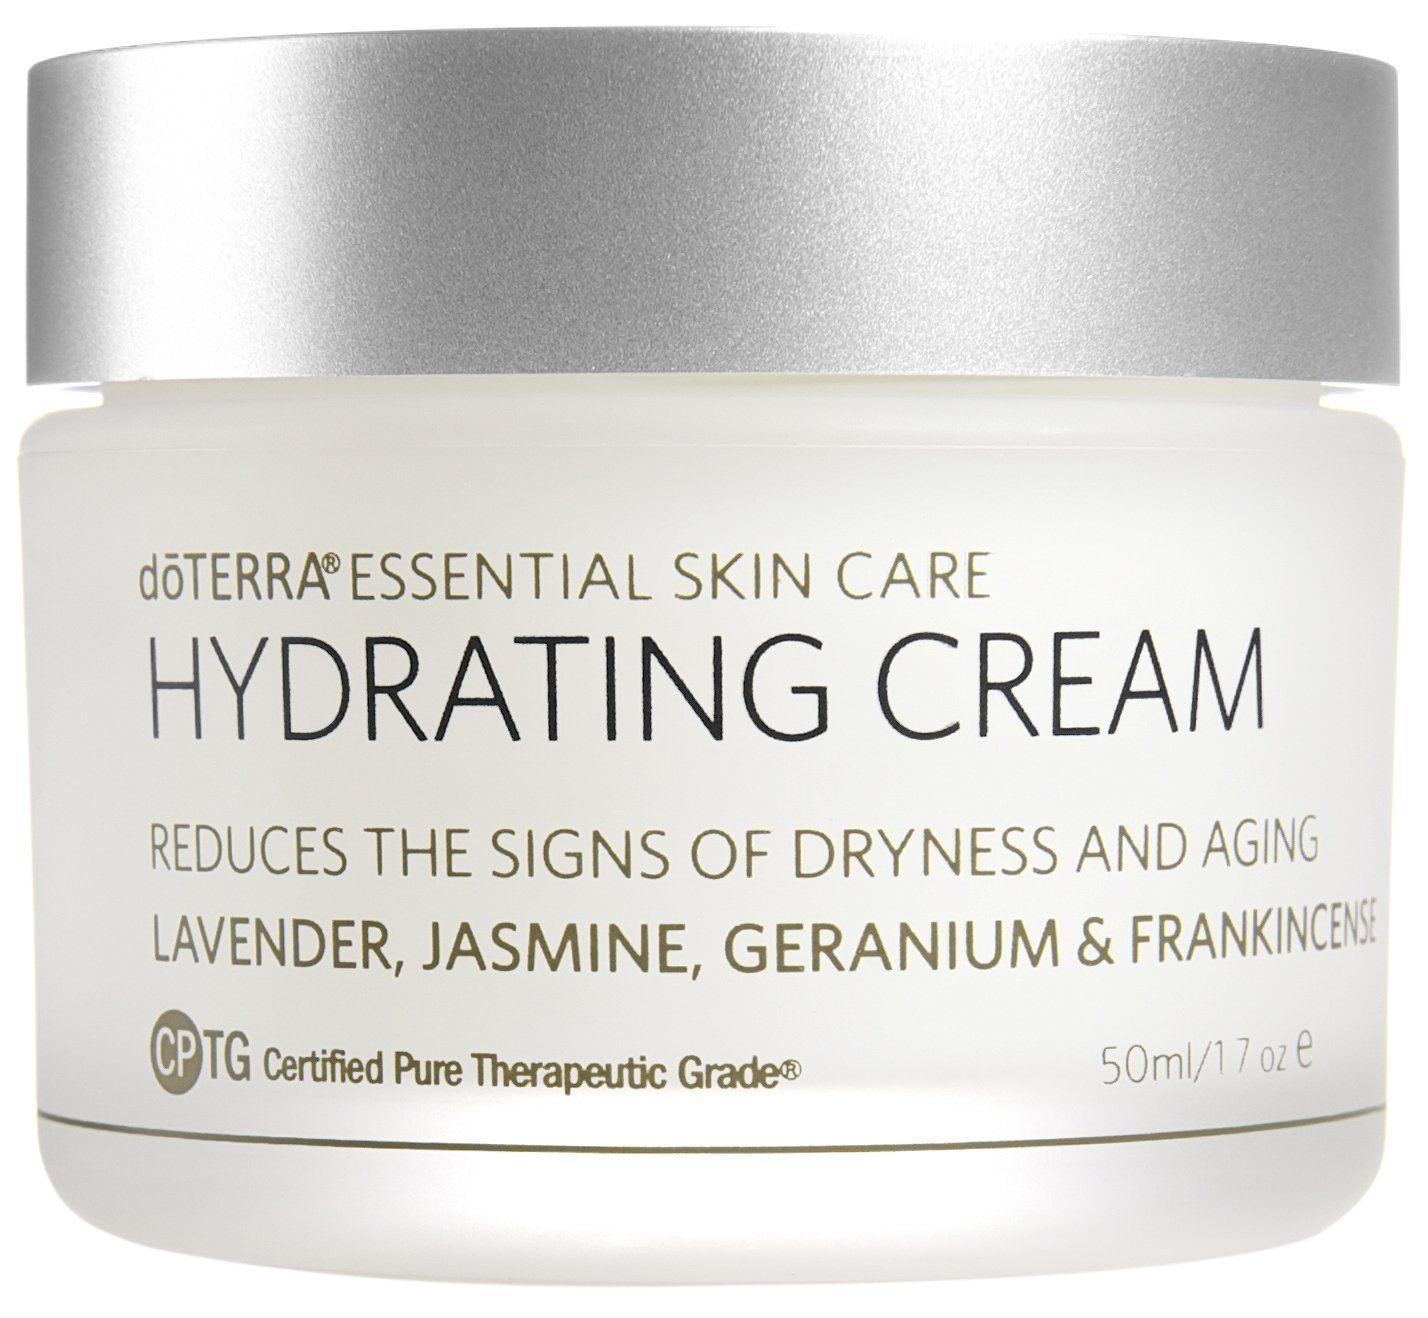 Doterra Hydrating Cream Essential Skin Care Collection 1 7 Oz Doterra Hydrating Cream Enriches Skin Care Essentials Hydrating Cream Skin Care Collection